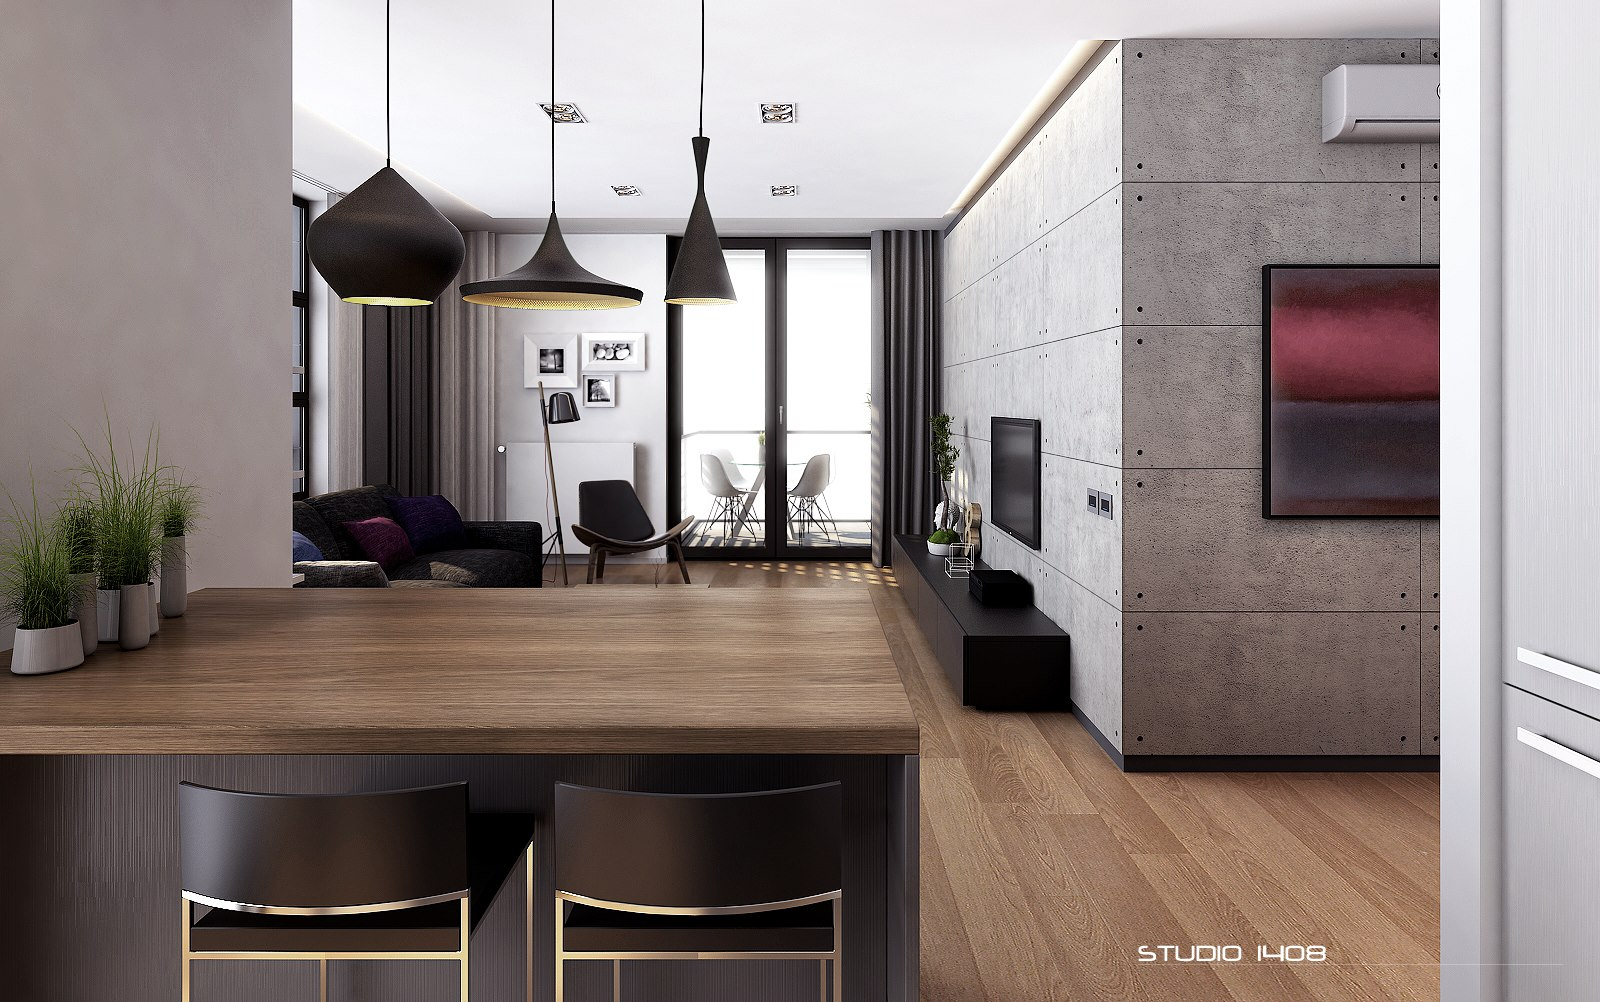 cool modern minimalist apartment design | Apartment Living for the Modern Minimalist